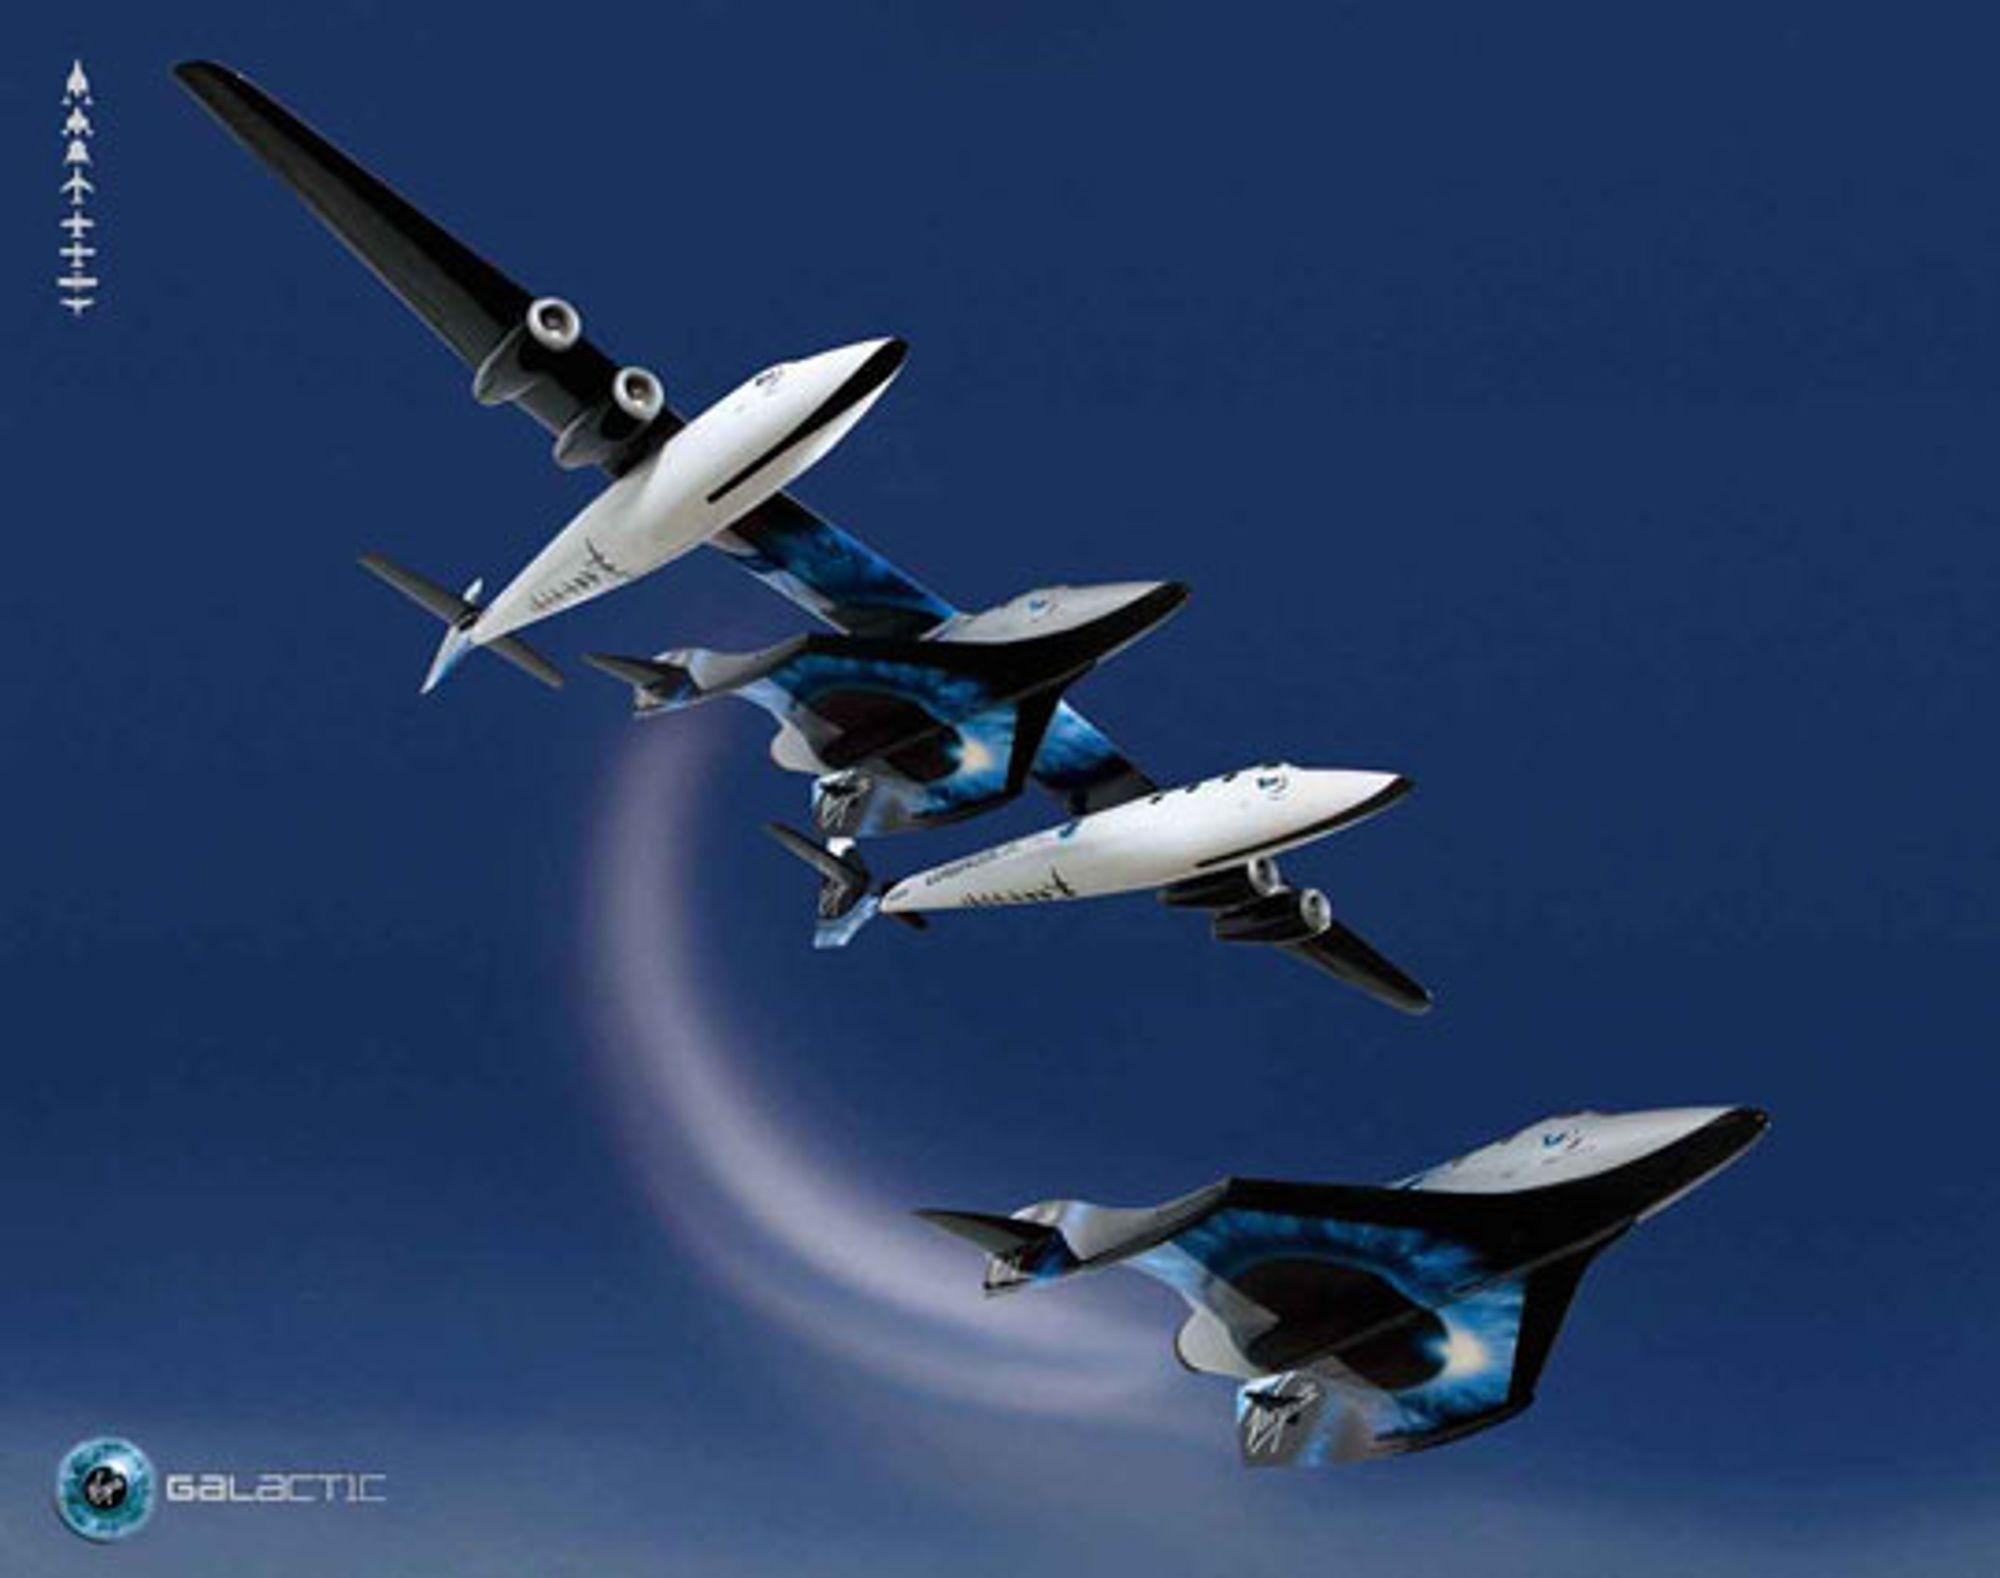 Whiteknighttwo som slipper løs Spaceshiptwo. Foto: Virgin Galactic